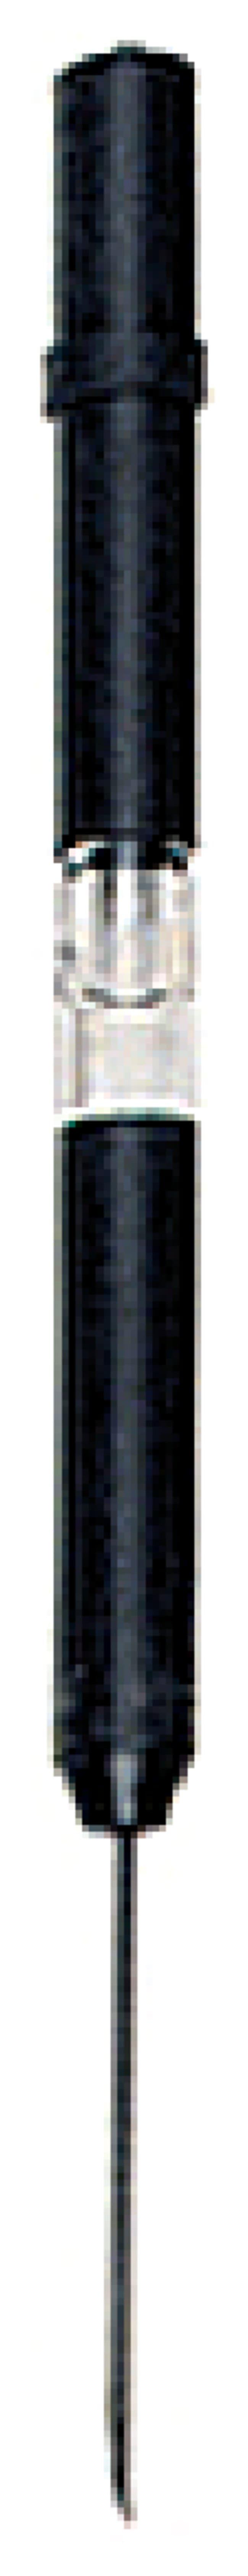 Thermo Scientific™Orion™ 9863BN Micro pH Electrode